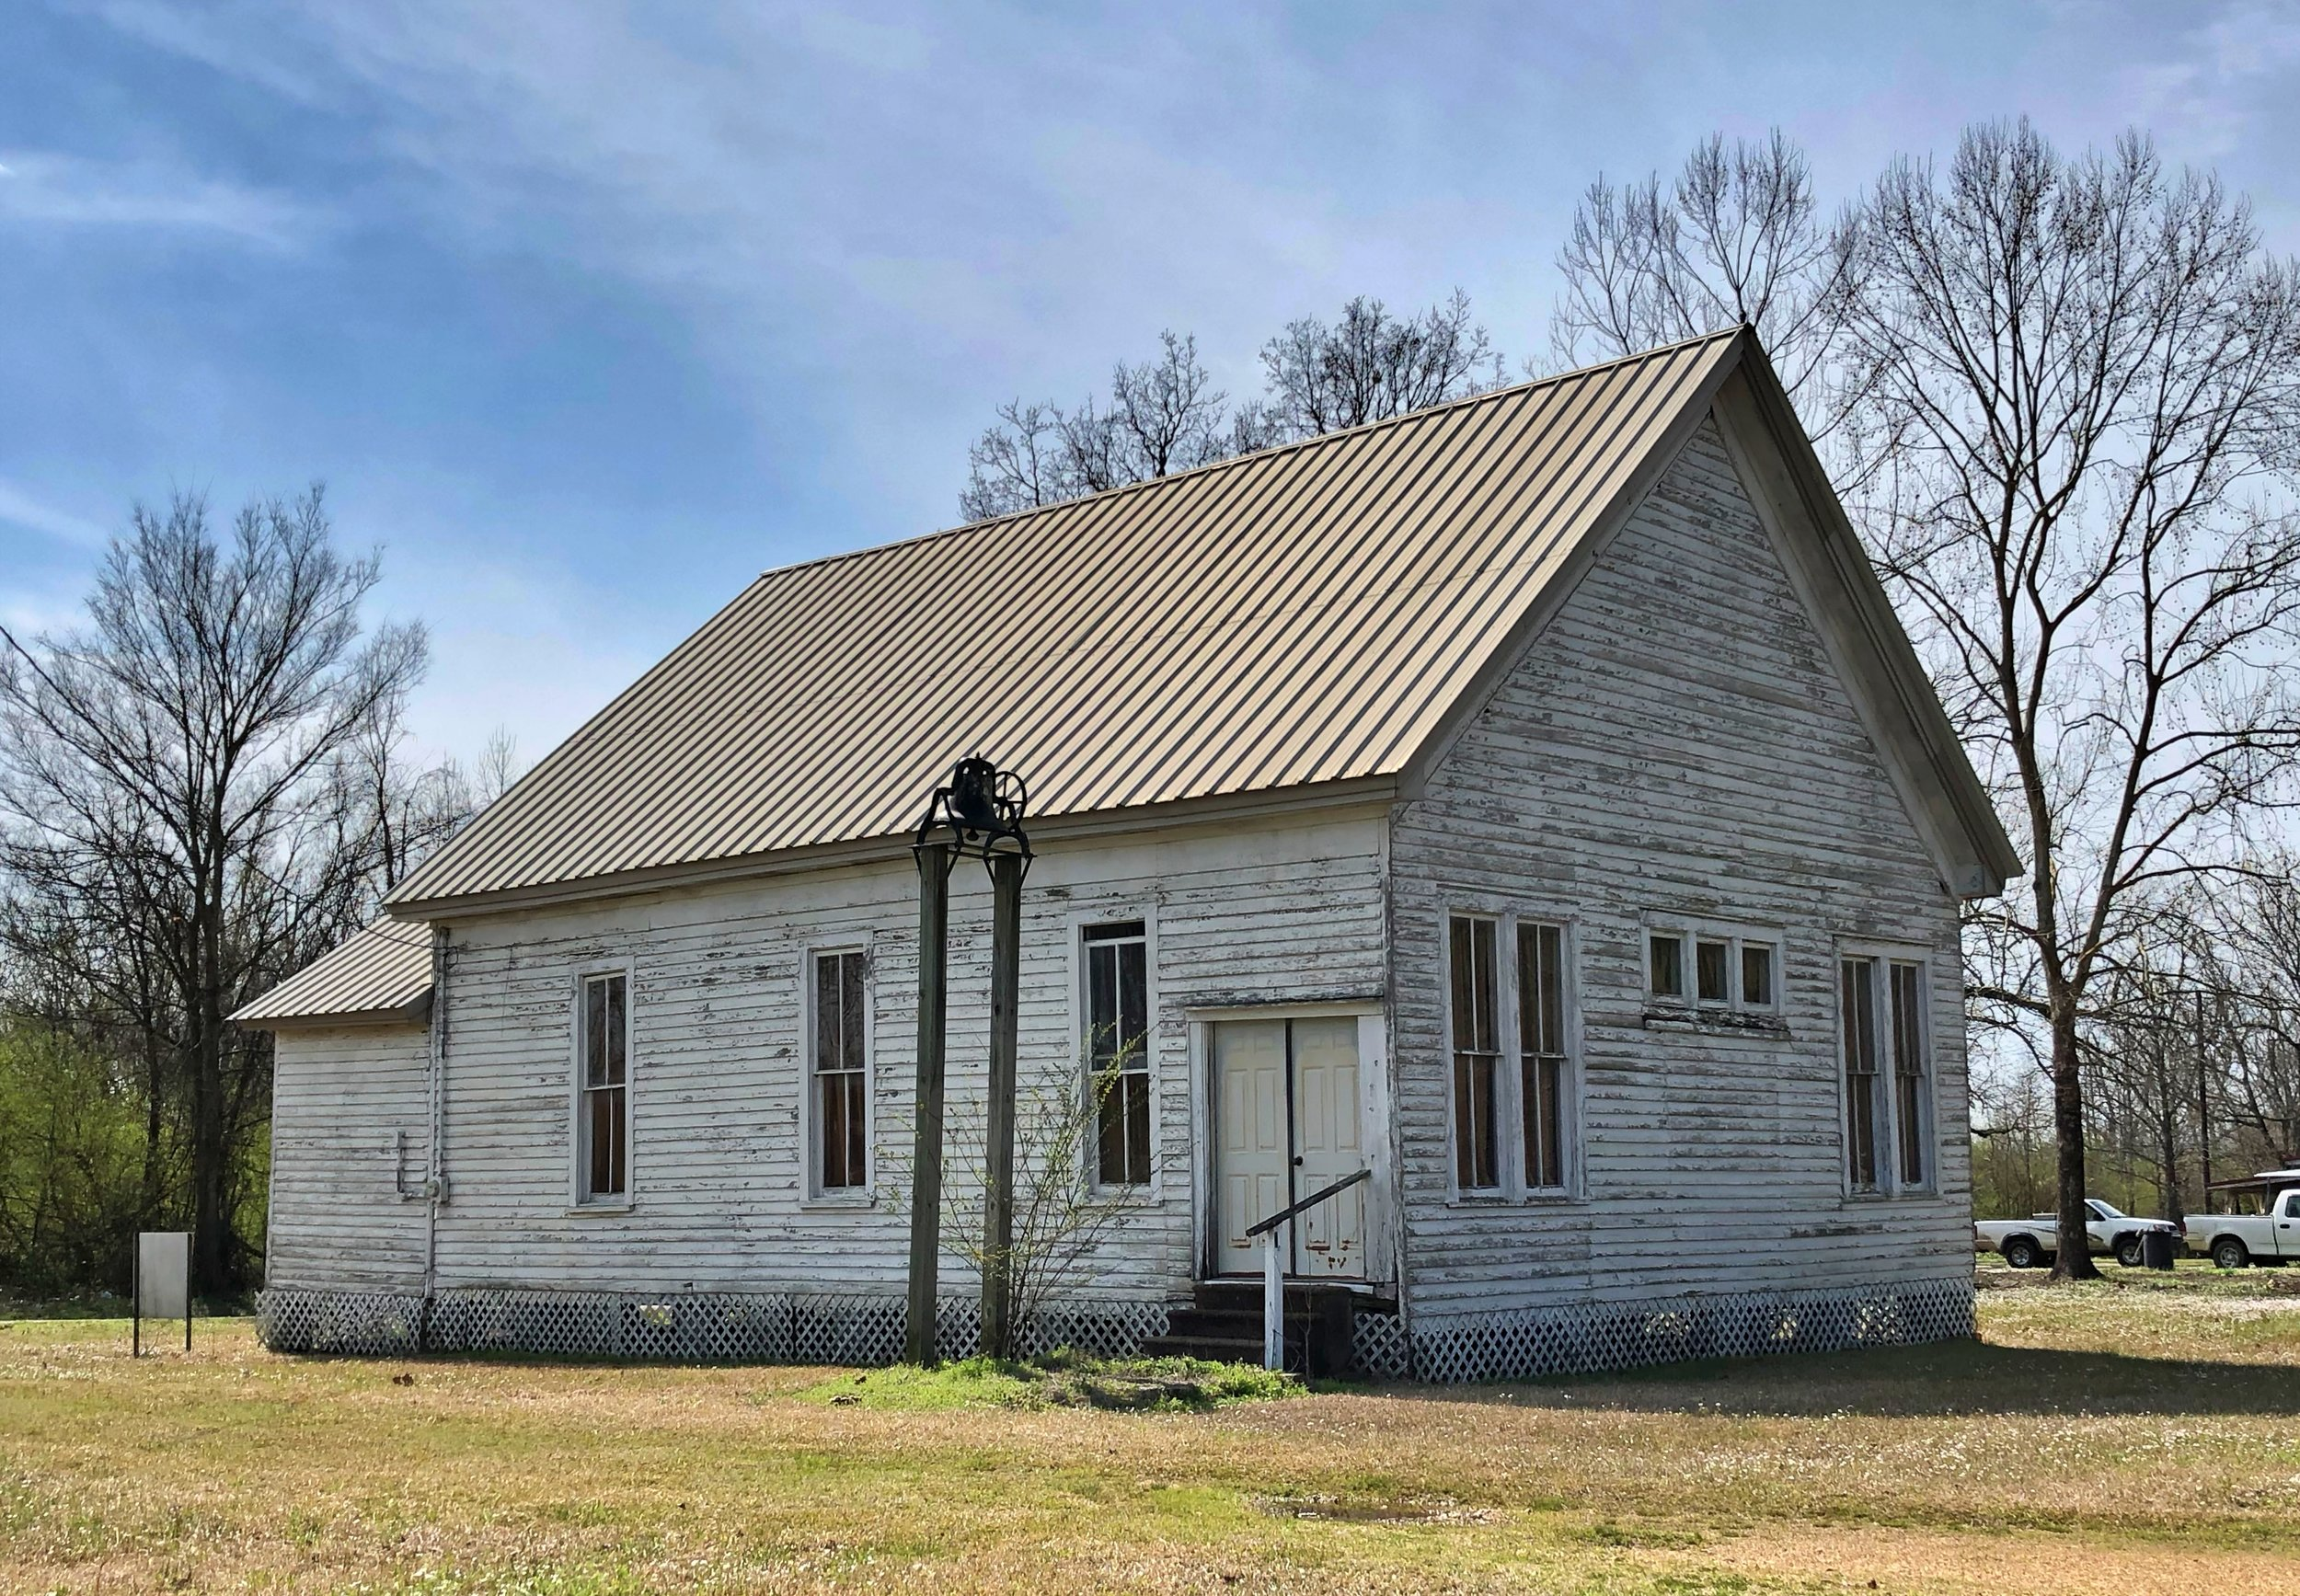 Church in Pheba, Miss.